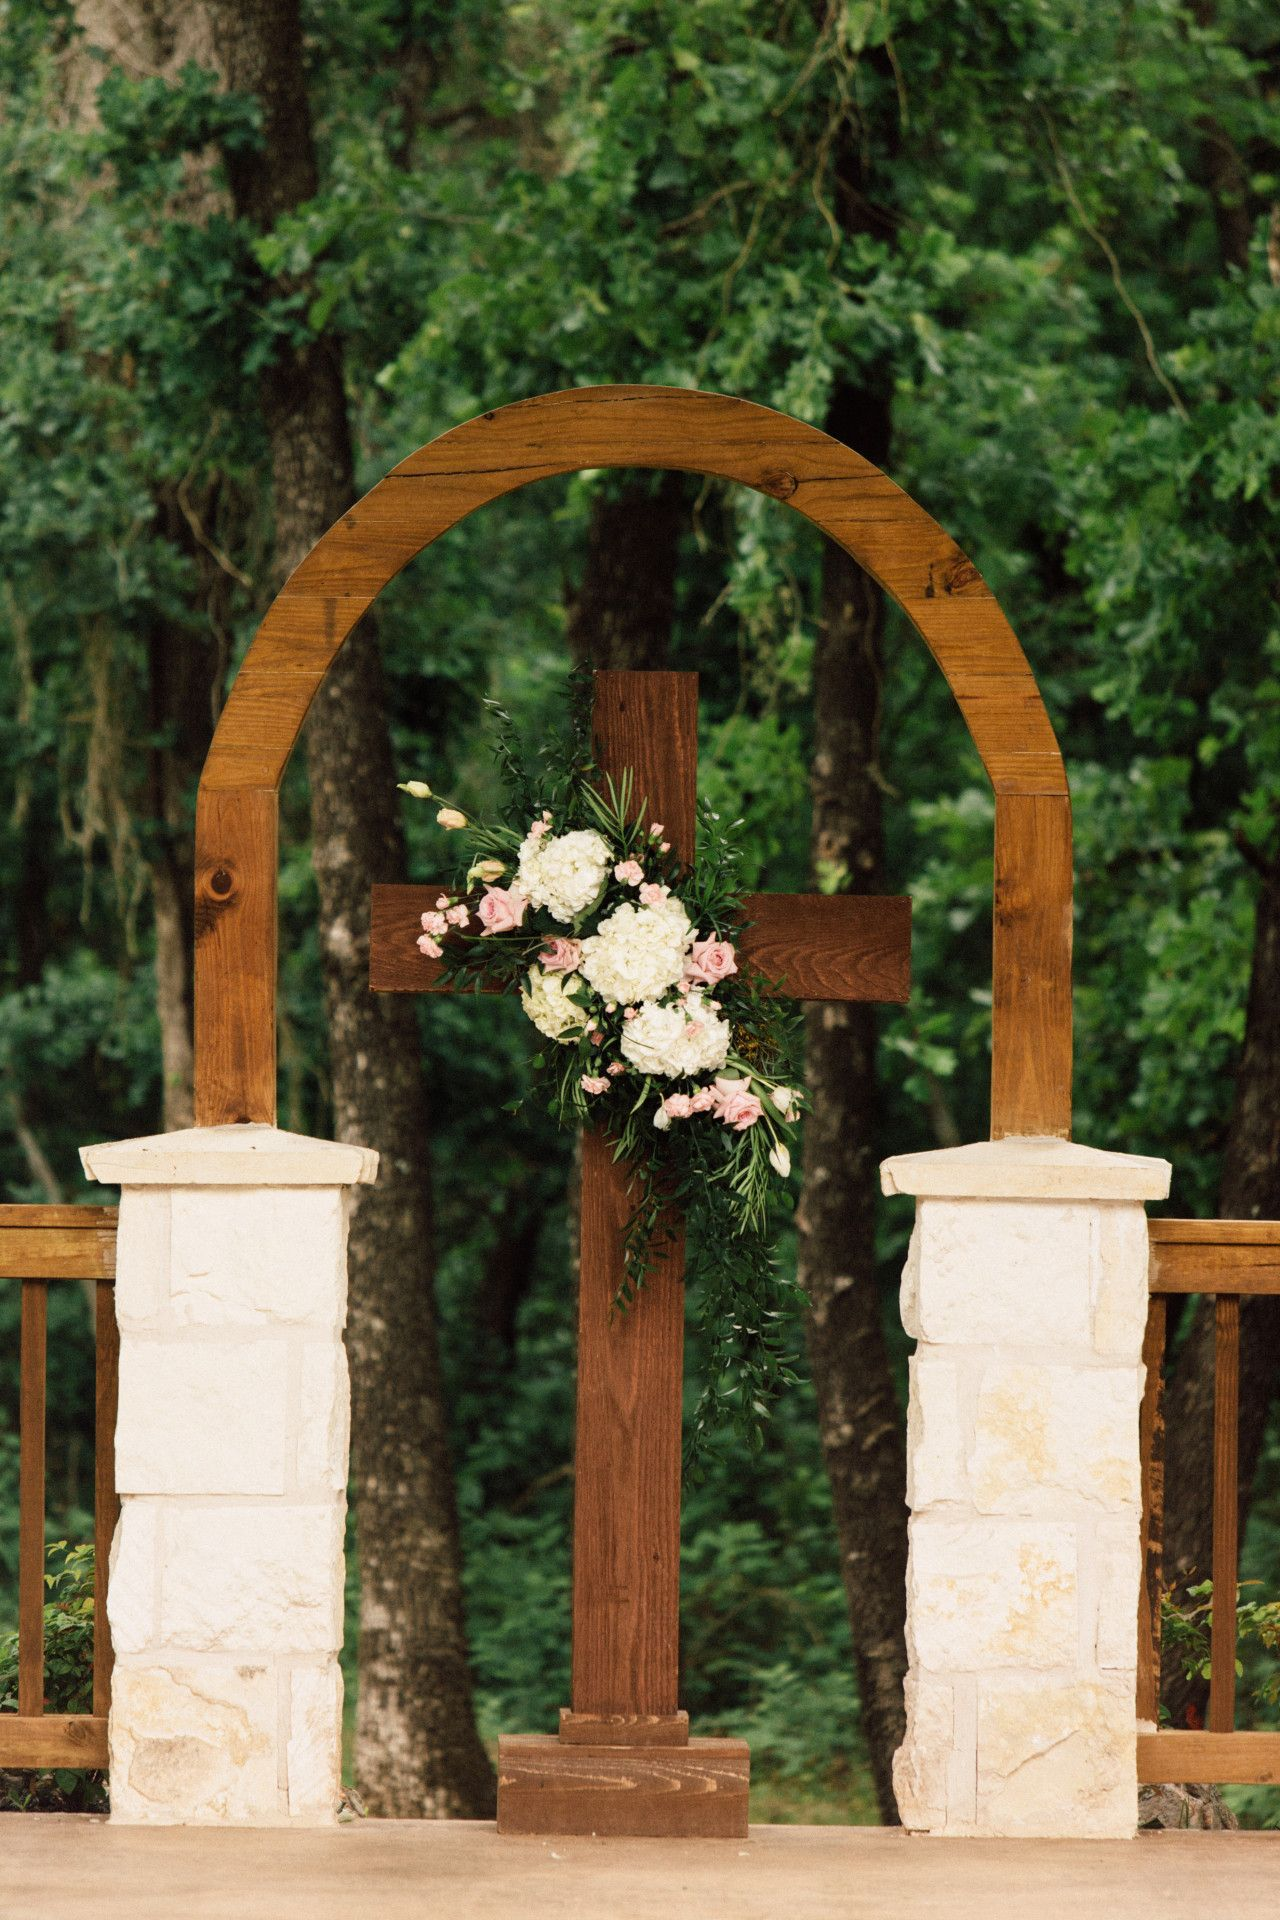 Wedding venue decoration ideas  Wedding Venue Norman Oklahoma  wedding decor  Pinterest  Wedding